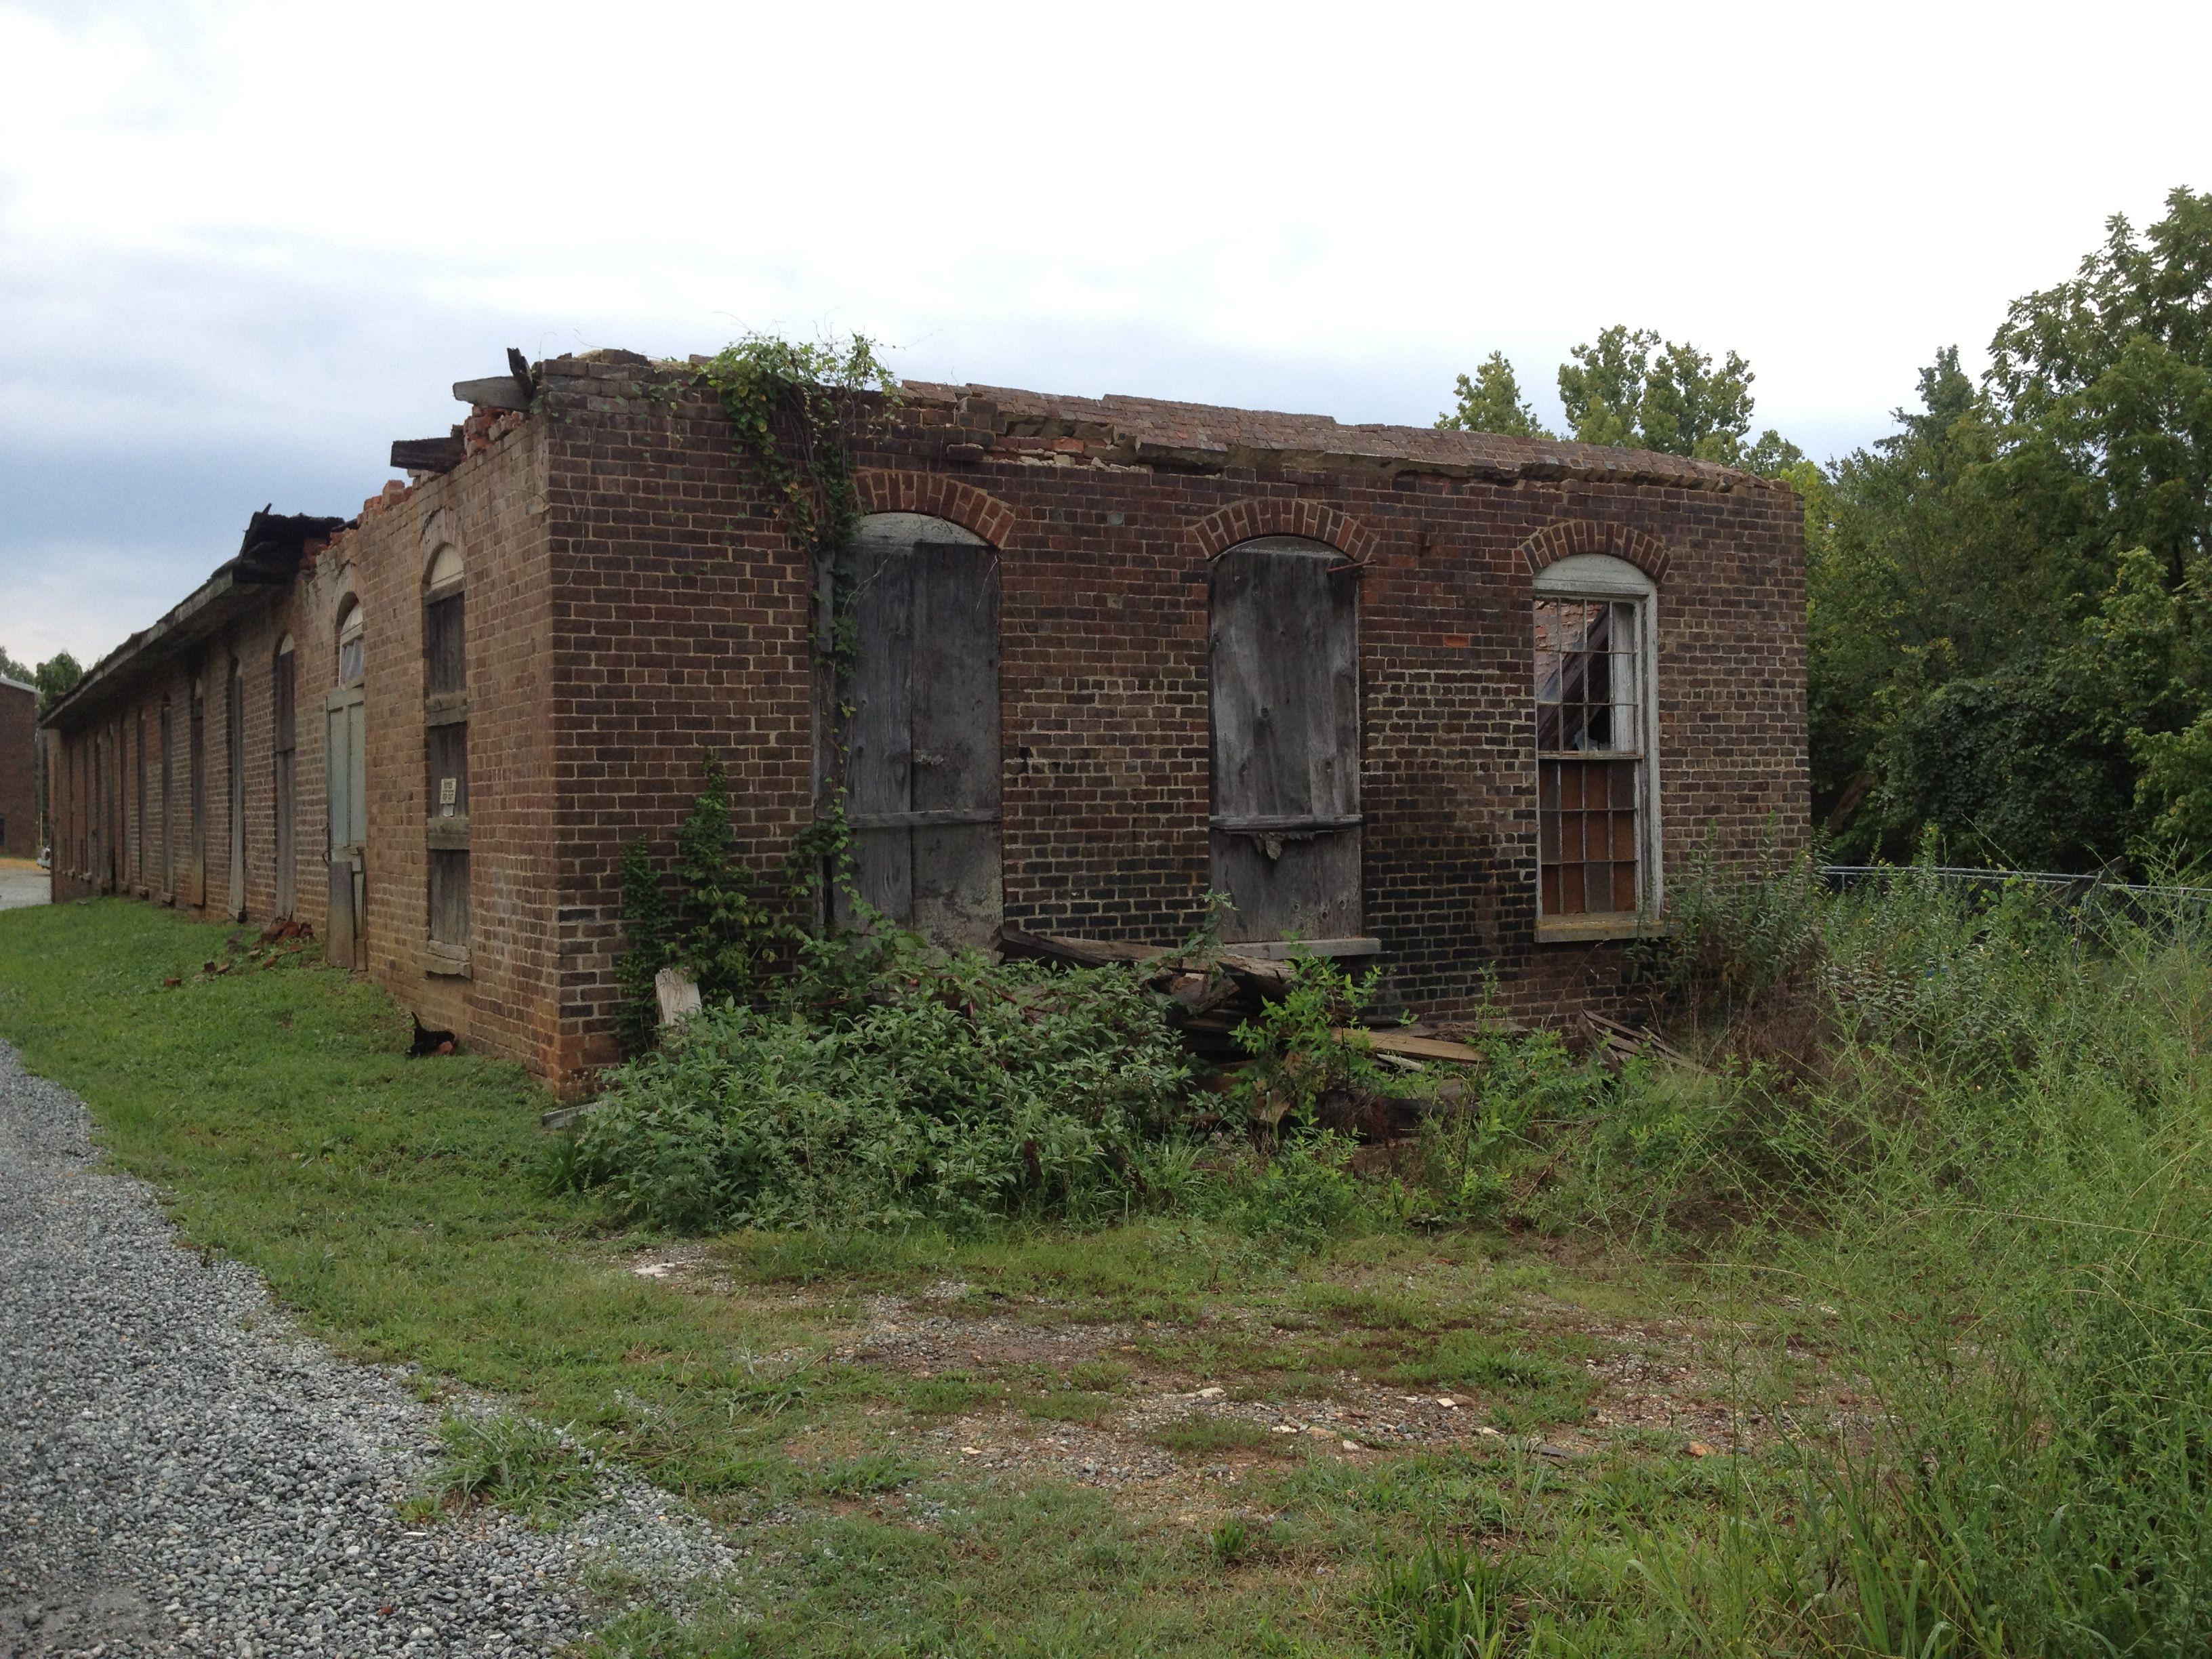 Troy, Missouri barn Barn, House styles, Abandoned buildings